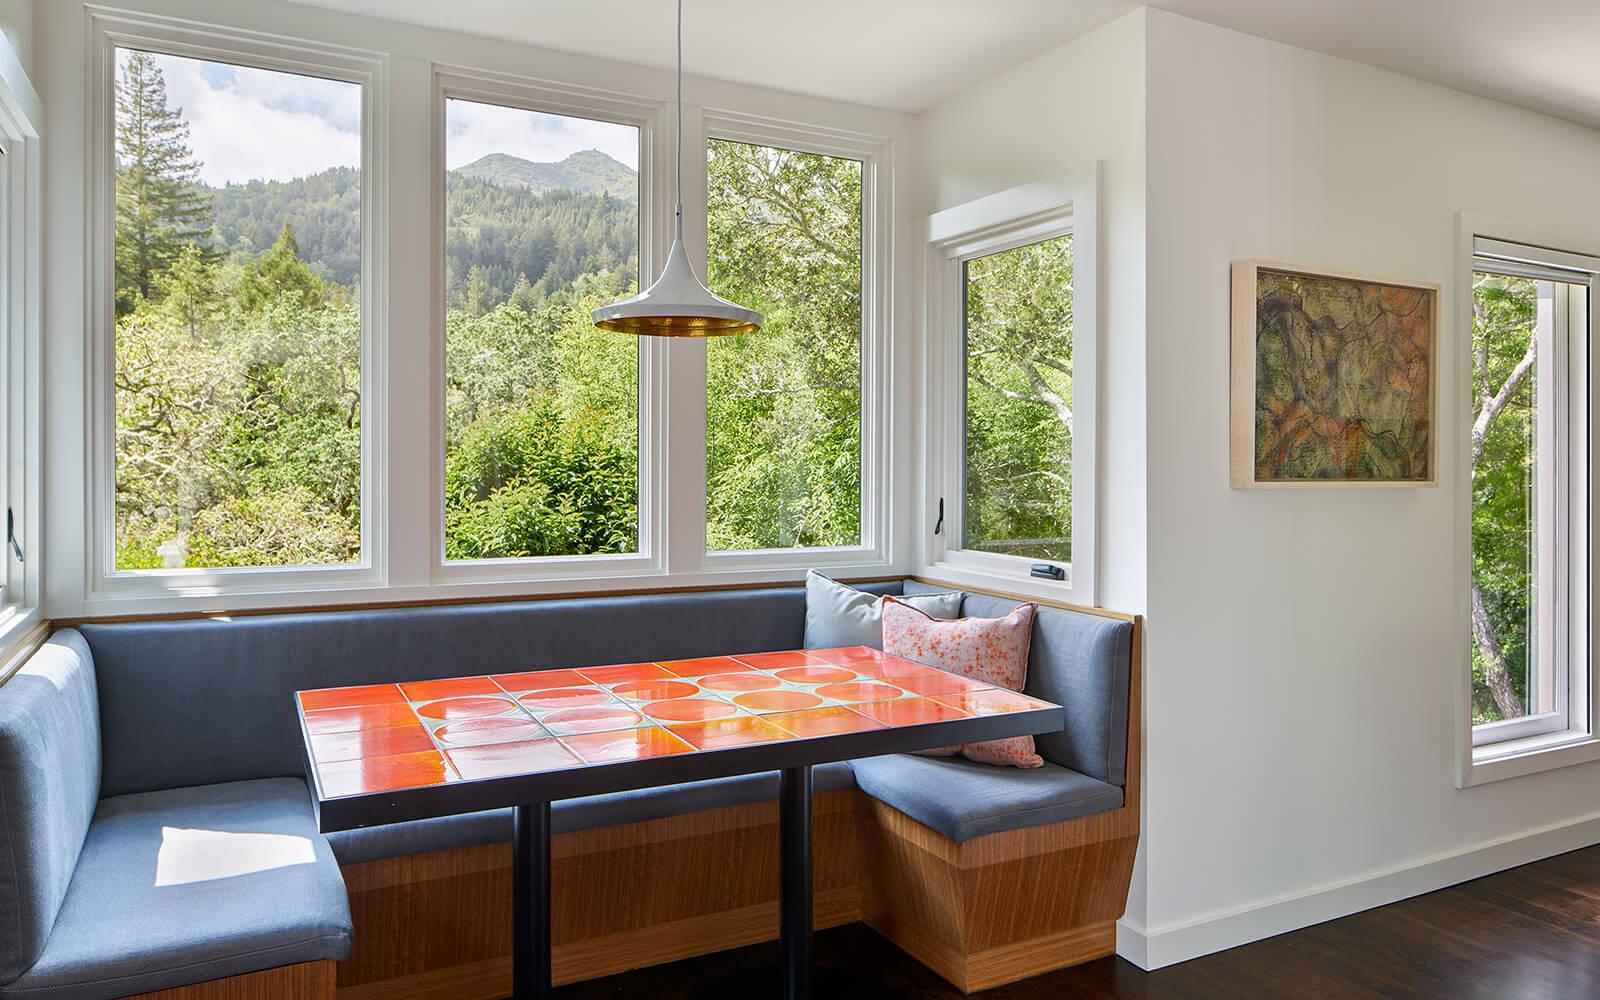 studio vara residential Kentfield dining bench